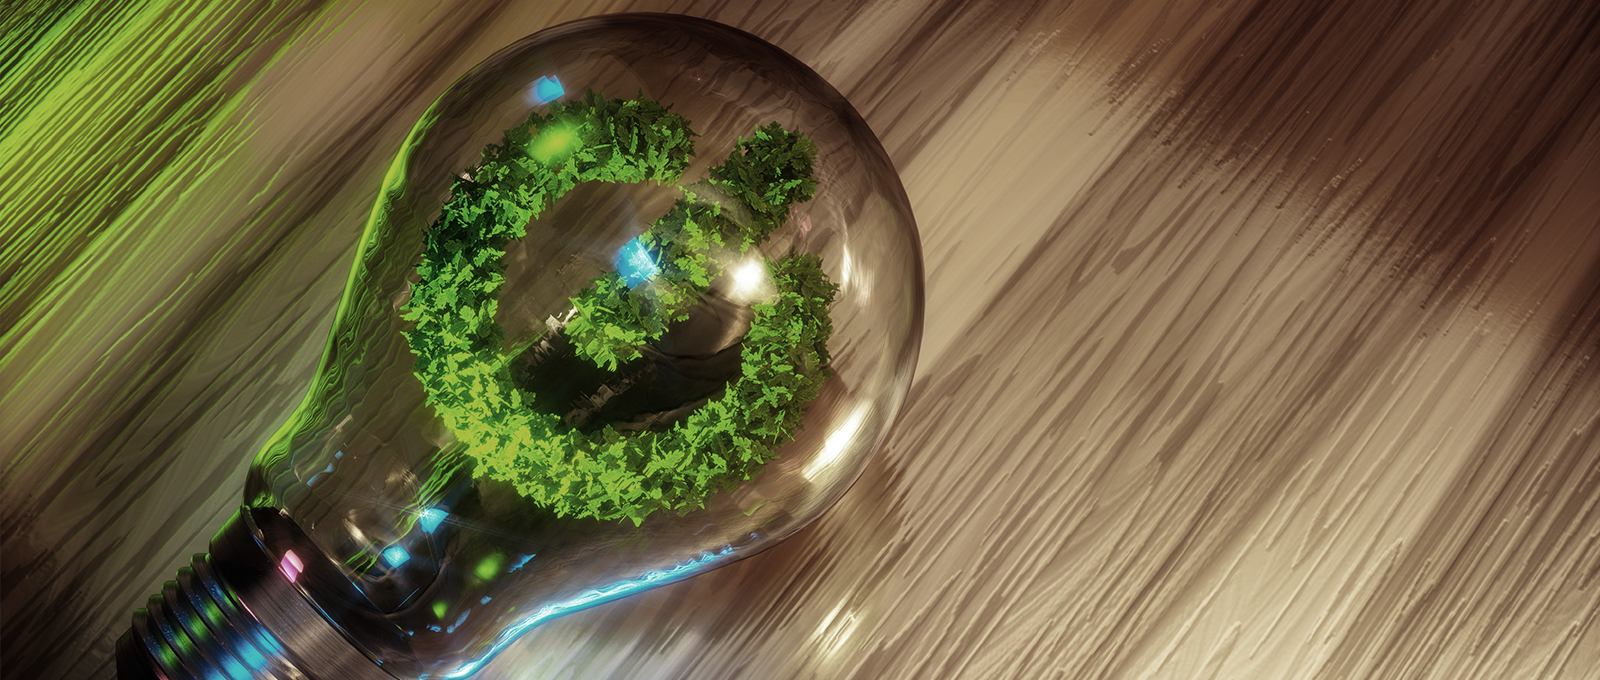 Prysmian Group sustainability innovation